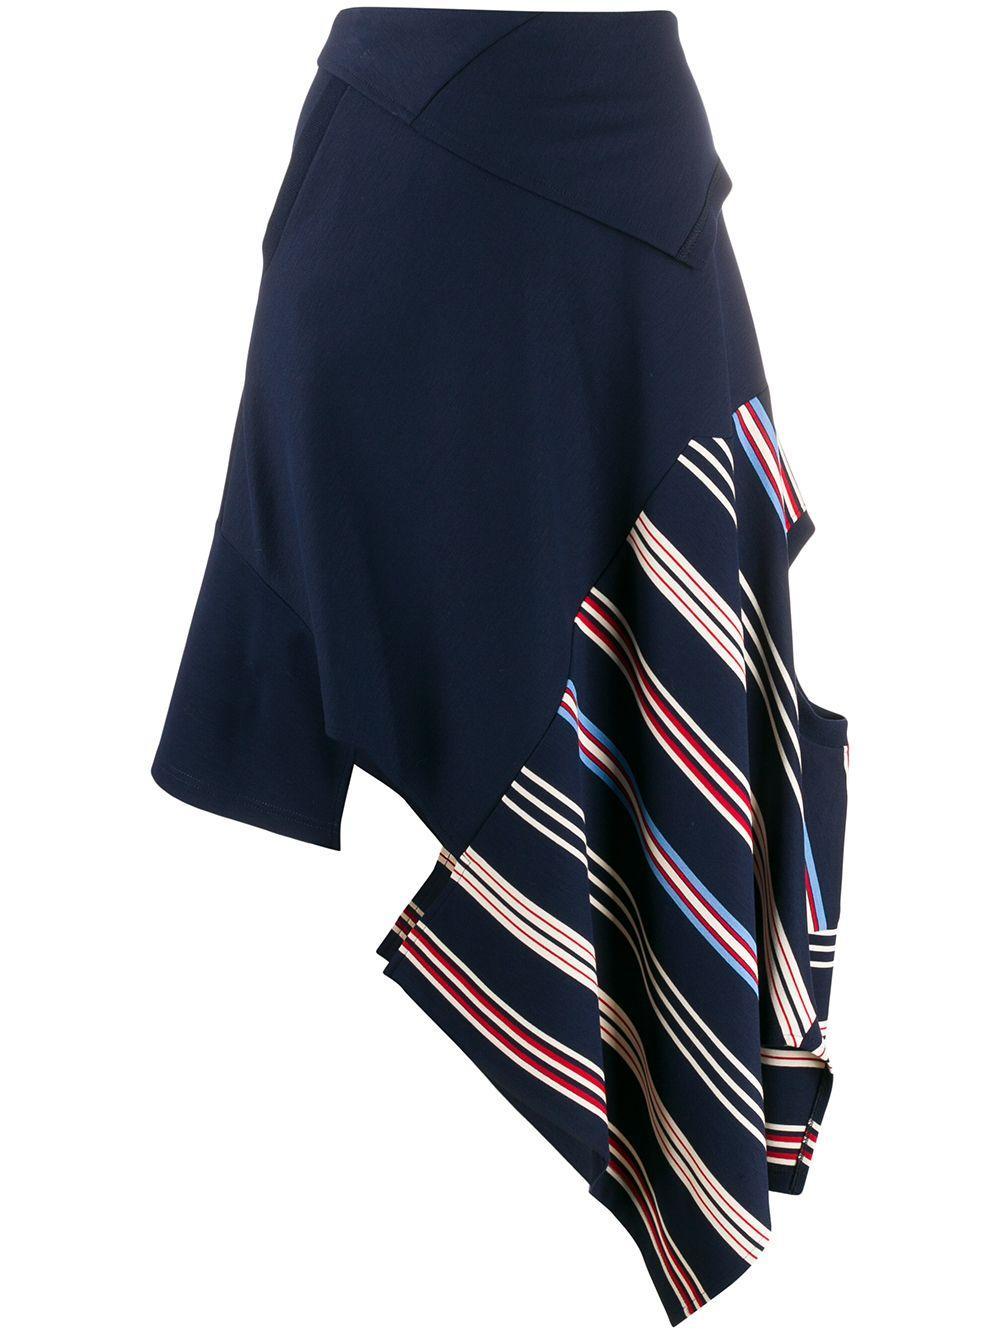 Monse юбка асимметричного кроя в полоску